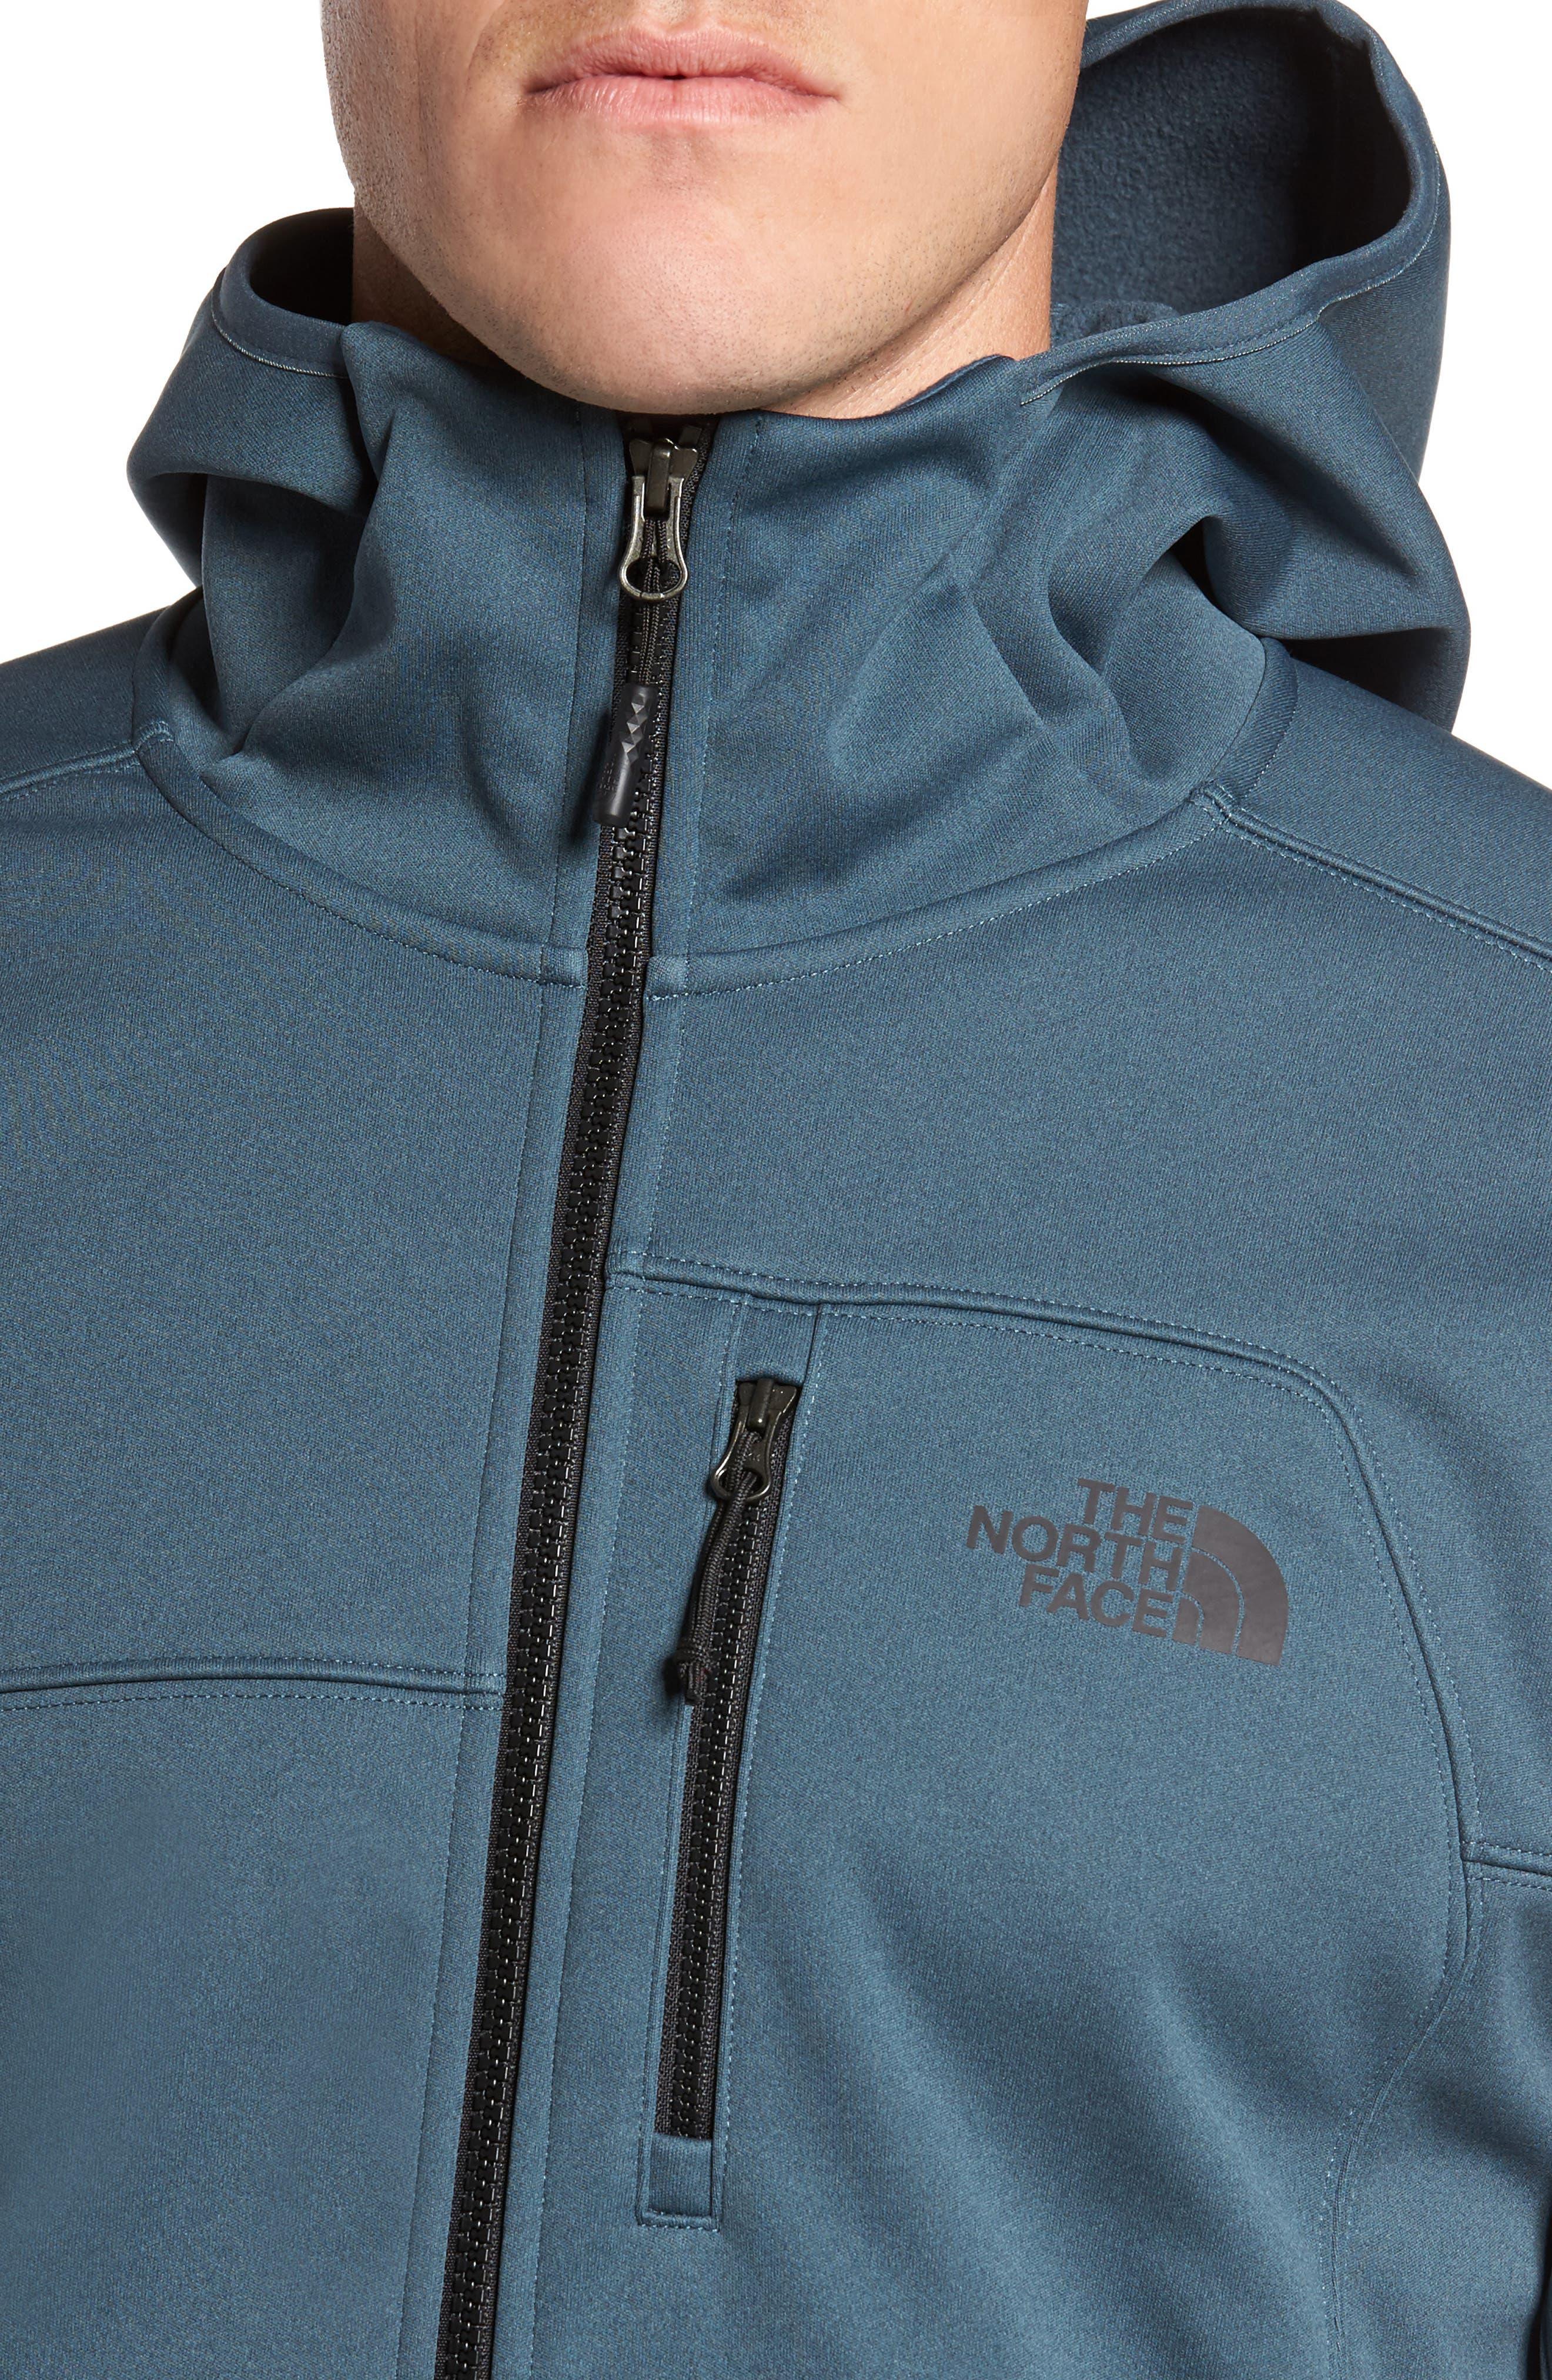 Apex Risor Jacket,                             Alternate thumbnail 4, color,                             Conquer Blue Heather